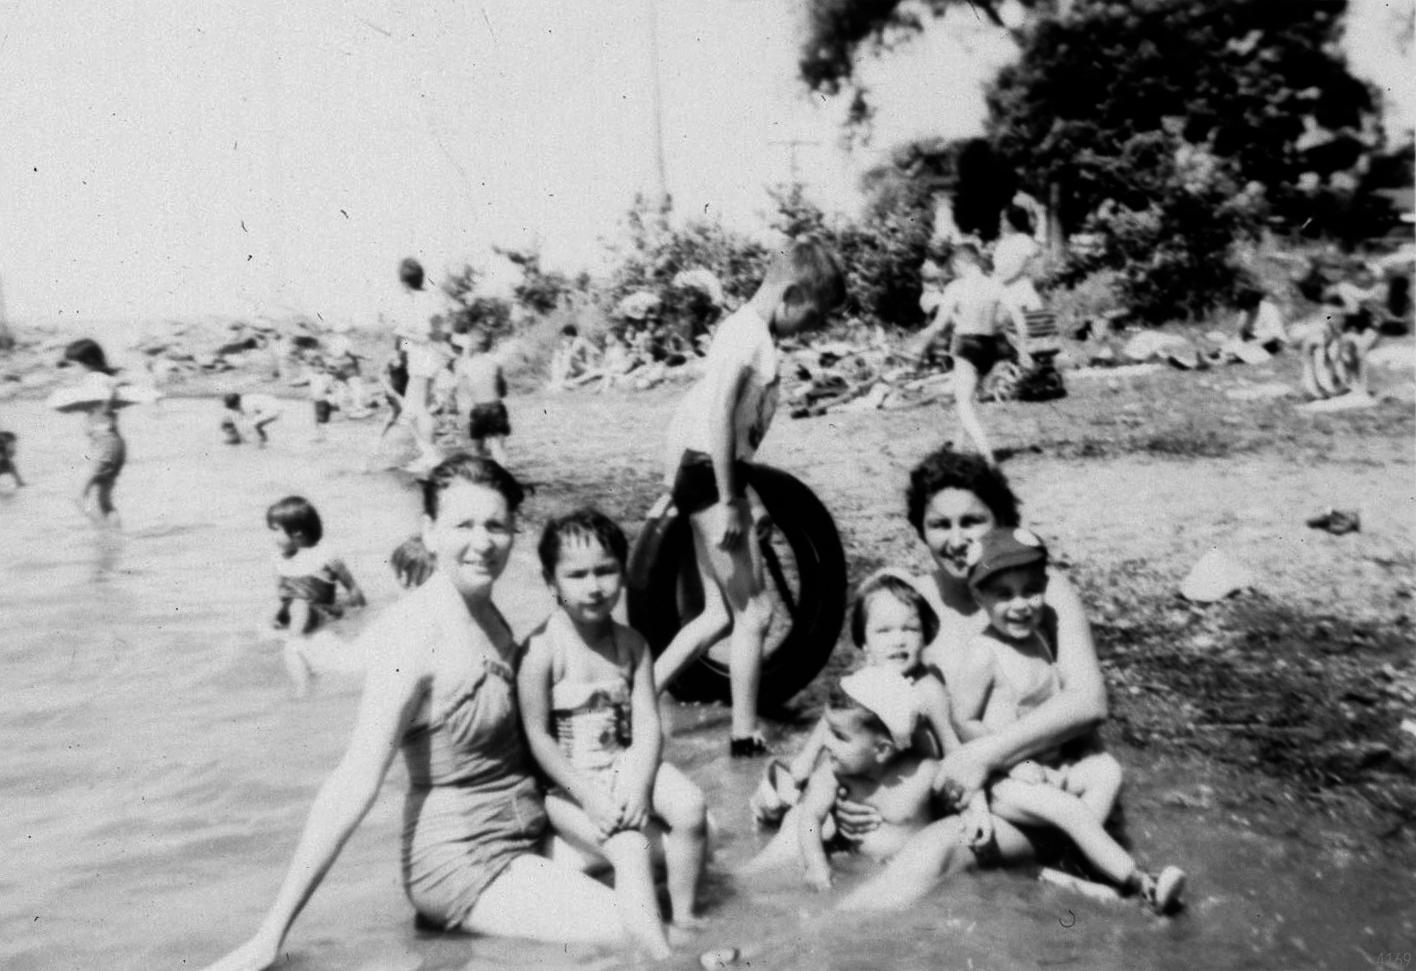 Johnson's beach in Kahnawake circa 1959. (The Kahnawake Photo Archive/ Kanien'keháka Onkwawén:na Raotitióhkwa Language and Cultural Center)